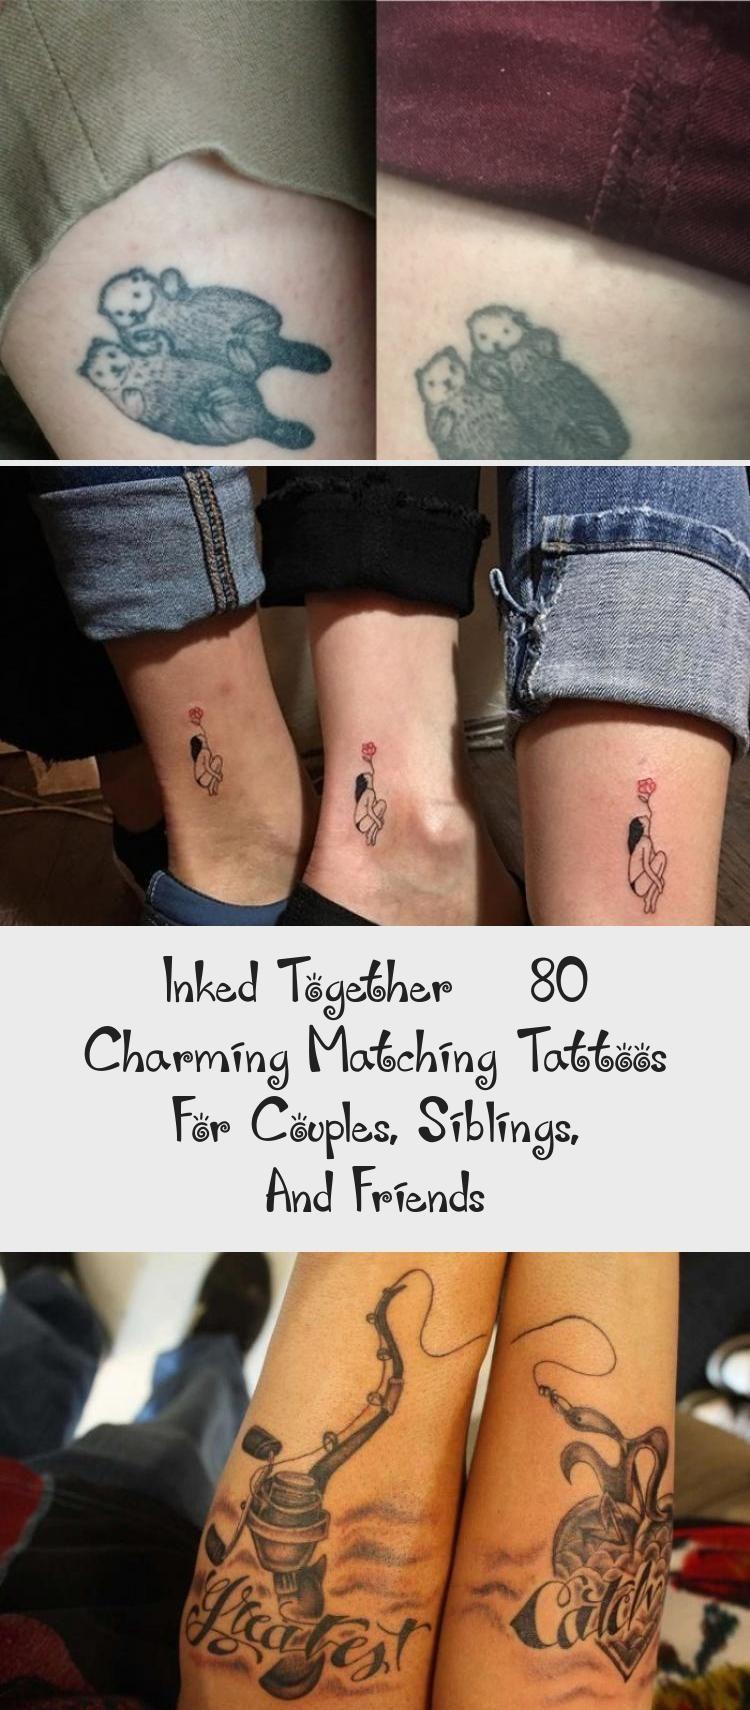 Harry Potter Inspired Minimalistic Tattoos Small Black Lightning Bolts Matching Bestfriend Tattoos Done Near The Sli In 2020 Matching Tattoos Friend Tattoos Tattoos